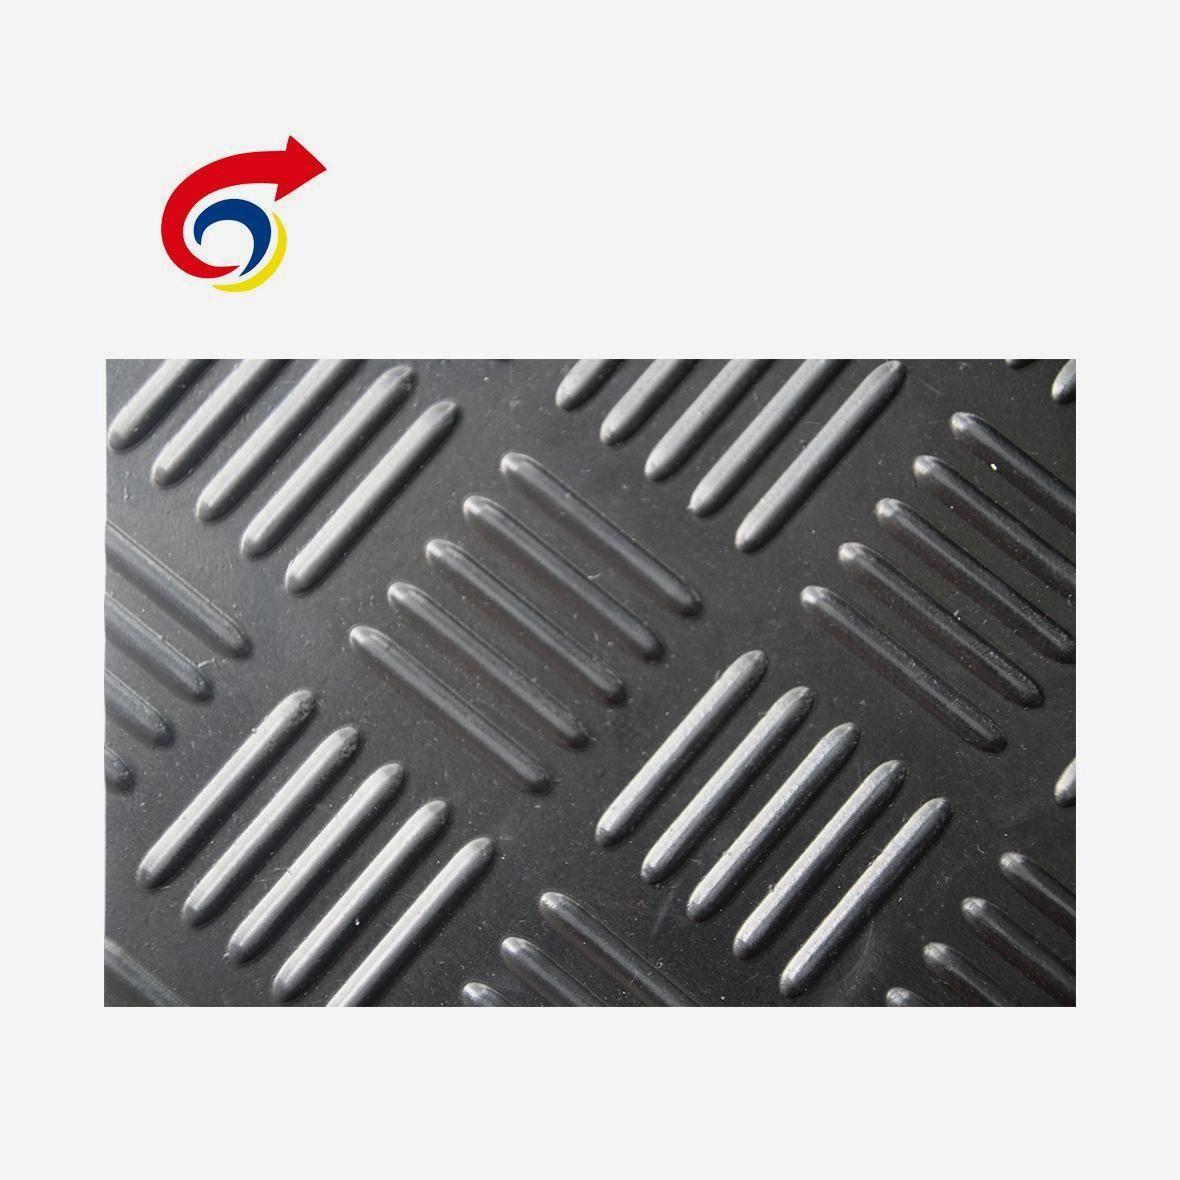 Insulating Rubber Sheet Five Stroke Armband 2195 Rubber Rubber Mat Sheets